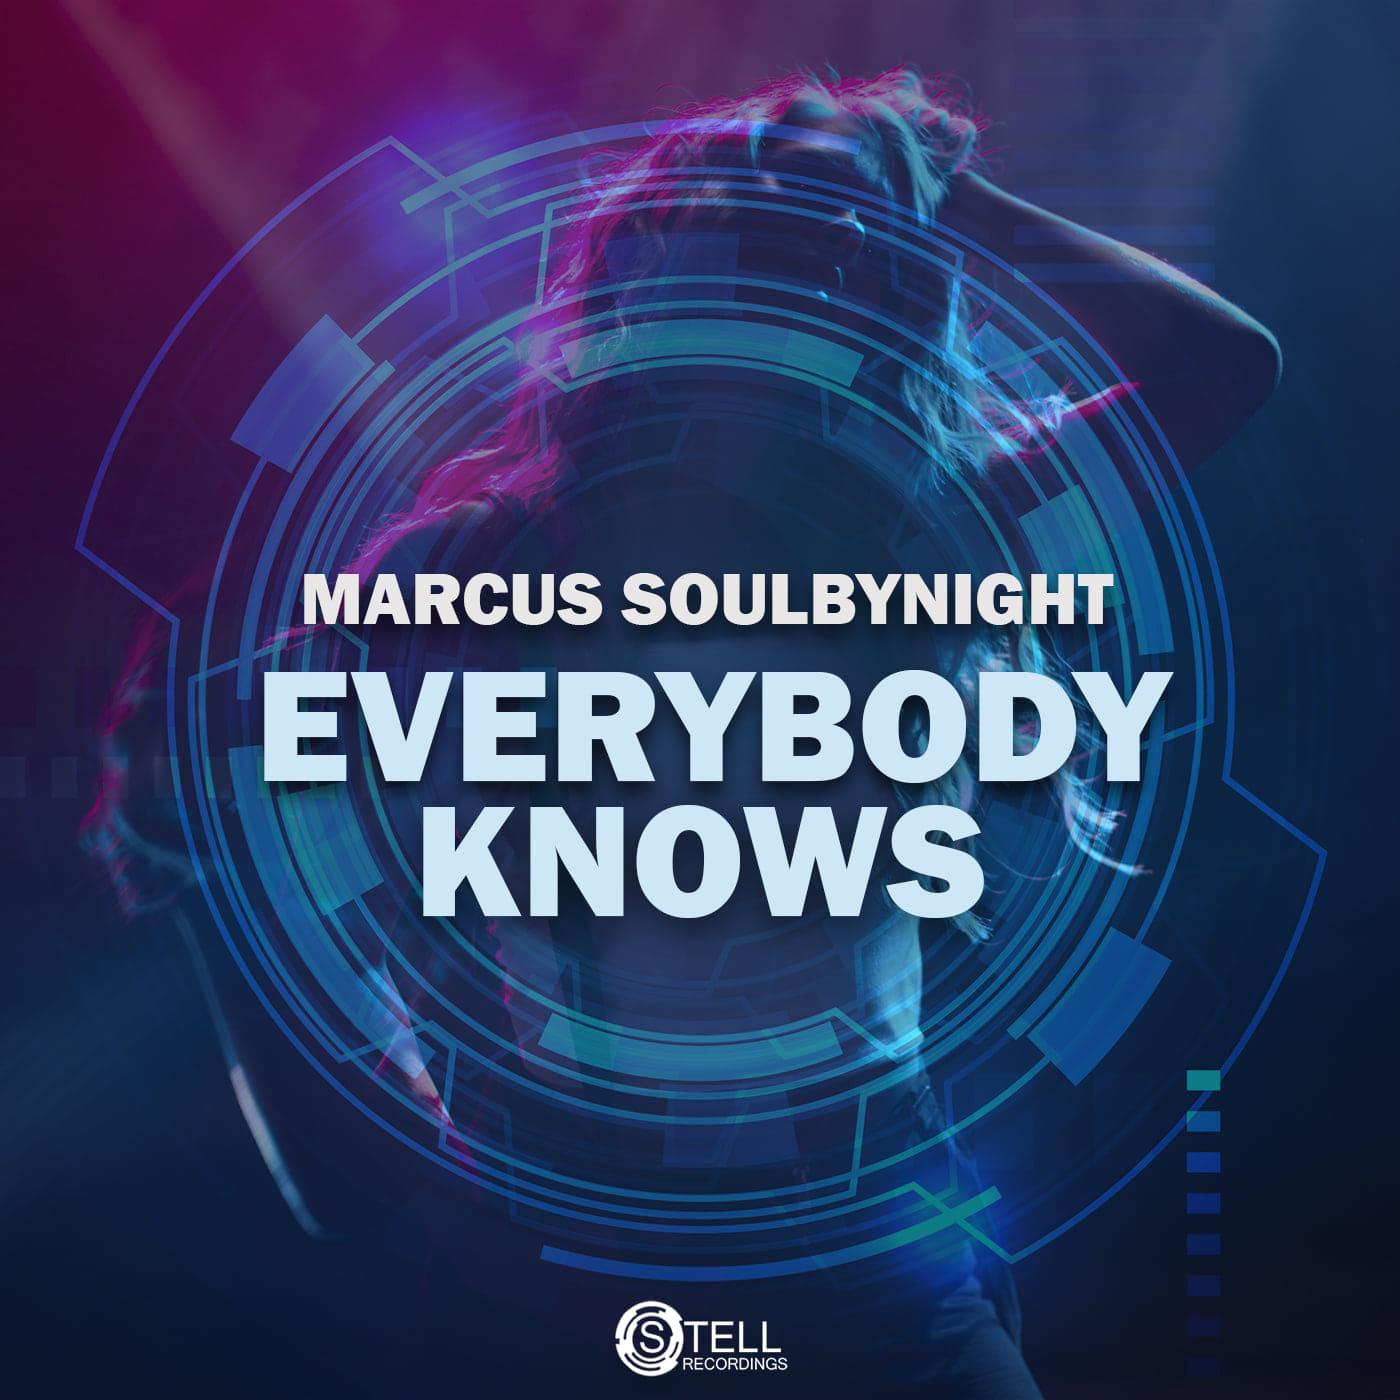 """Everybody knows"", il nuovo singolo di Marcus Soulbynight"